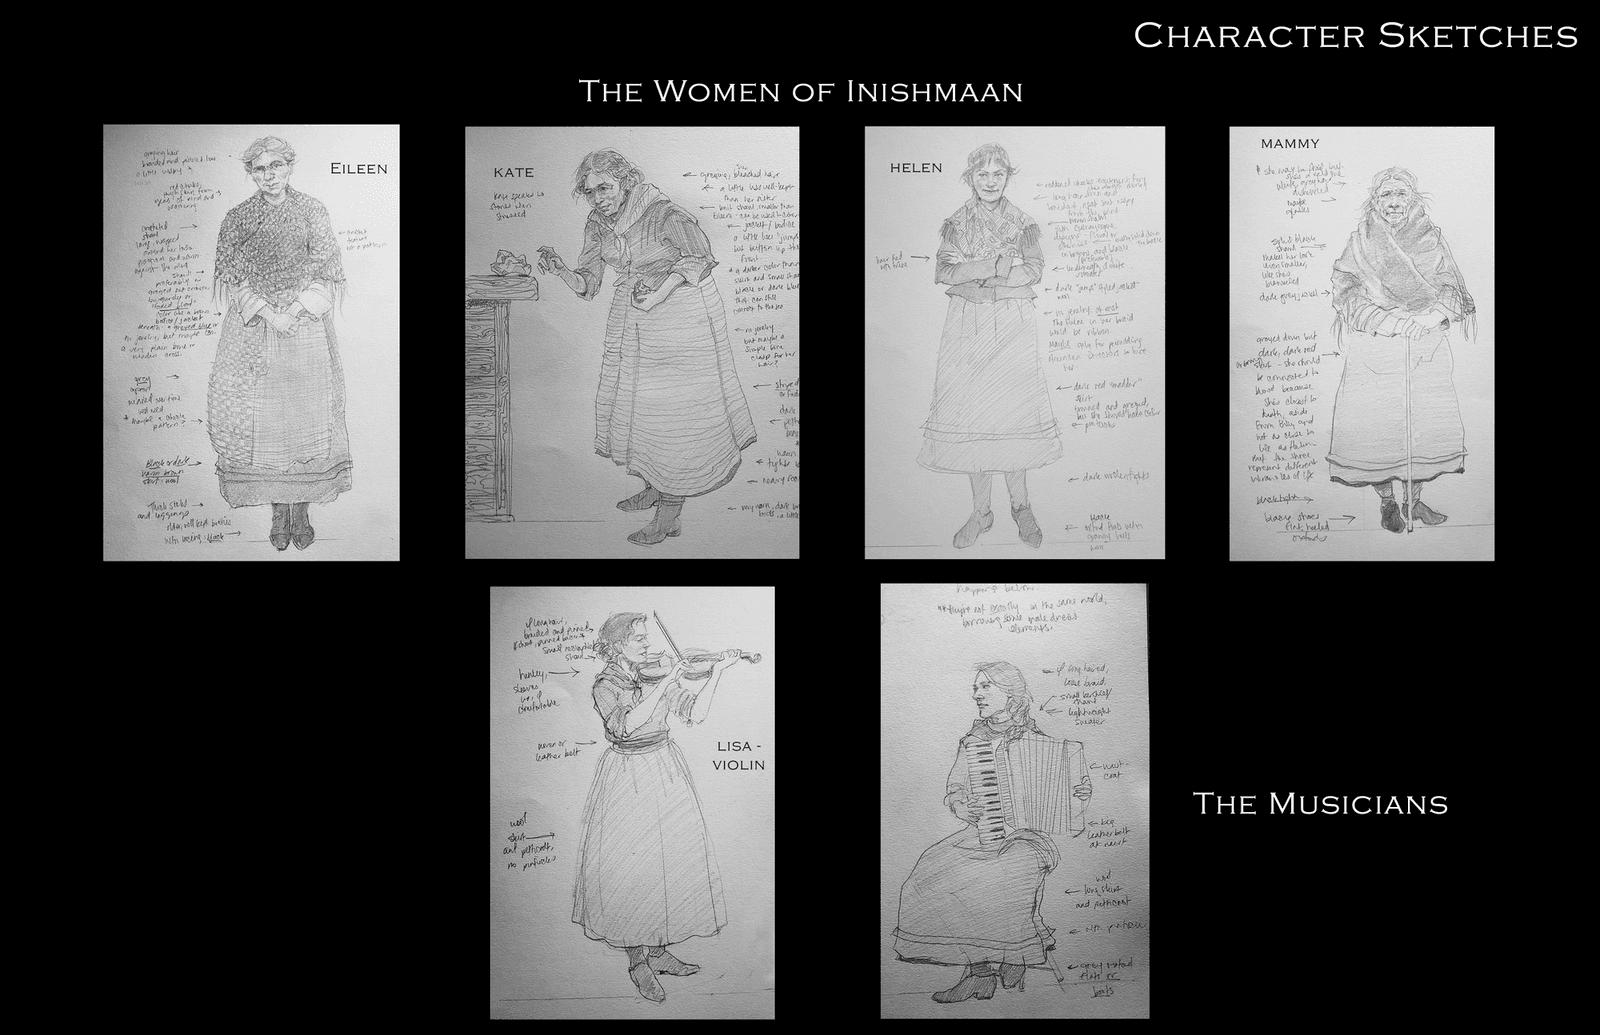 The Women of Inishmaan